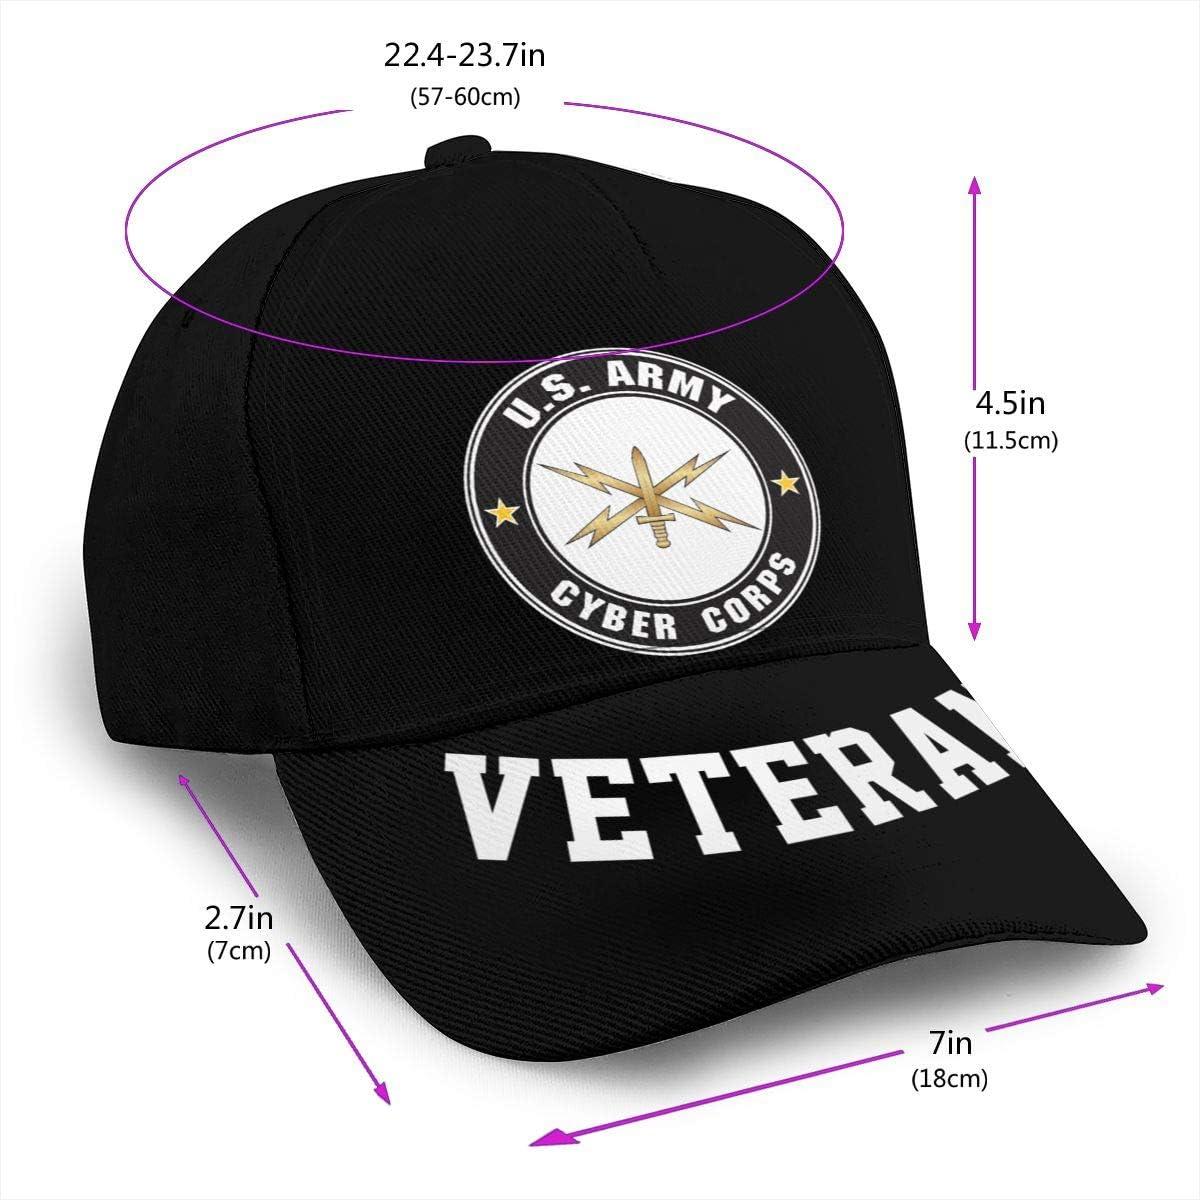 US Army Cyber Corps Baseball Cap Dad Hat Unisex Classic Sports Hat Peaked Cap Veteran Hat